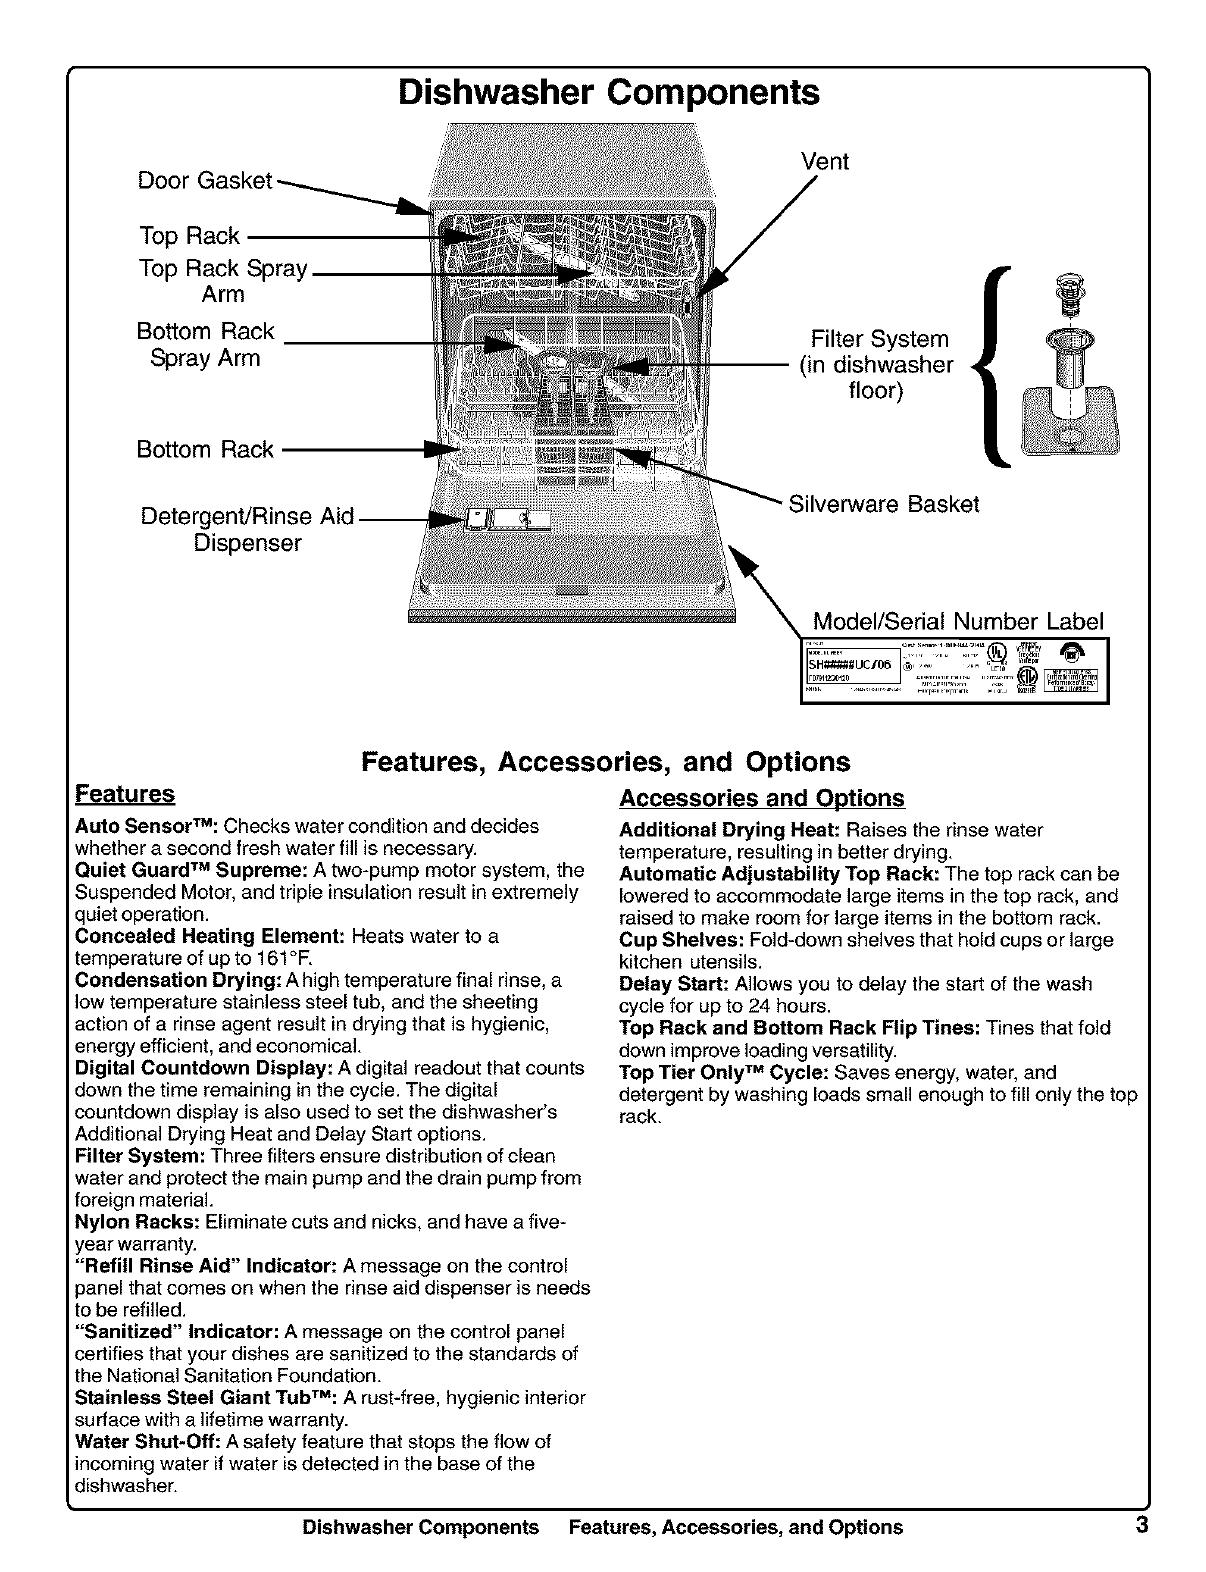 Kenmore 630.1630, 630.1730 Dishwasher Components on estate dishwasher schematic, dryer schematic, maytag dishwasher schematic, asko dishwasher schematic, dishwasher drain schematic, whirlpool dishwasher schematic, lg dishwasher schematic, kitchenaid dishwasher schematic, bosch dishwasher schematic, kenmore electric dryer wiring diagram, frigidaire dishwasher schematic, maytag washer schematic, kenmore dryer repair manual, ge washer schematic, washing machine schematic, whirlpool washer schematic, kenmore ice maker wiring-diagram, ge dishwasher schematic, ceiling fan schematic, miele dishwasher schematic,